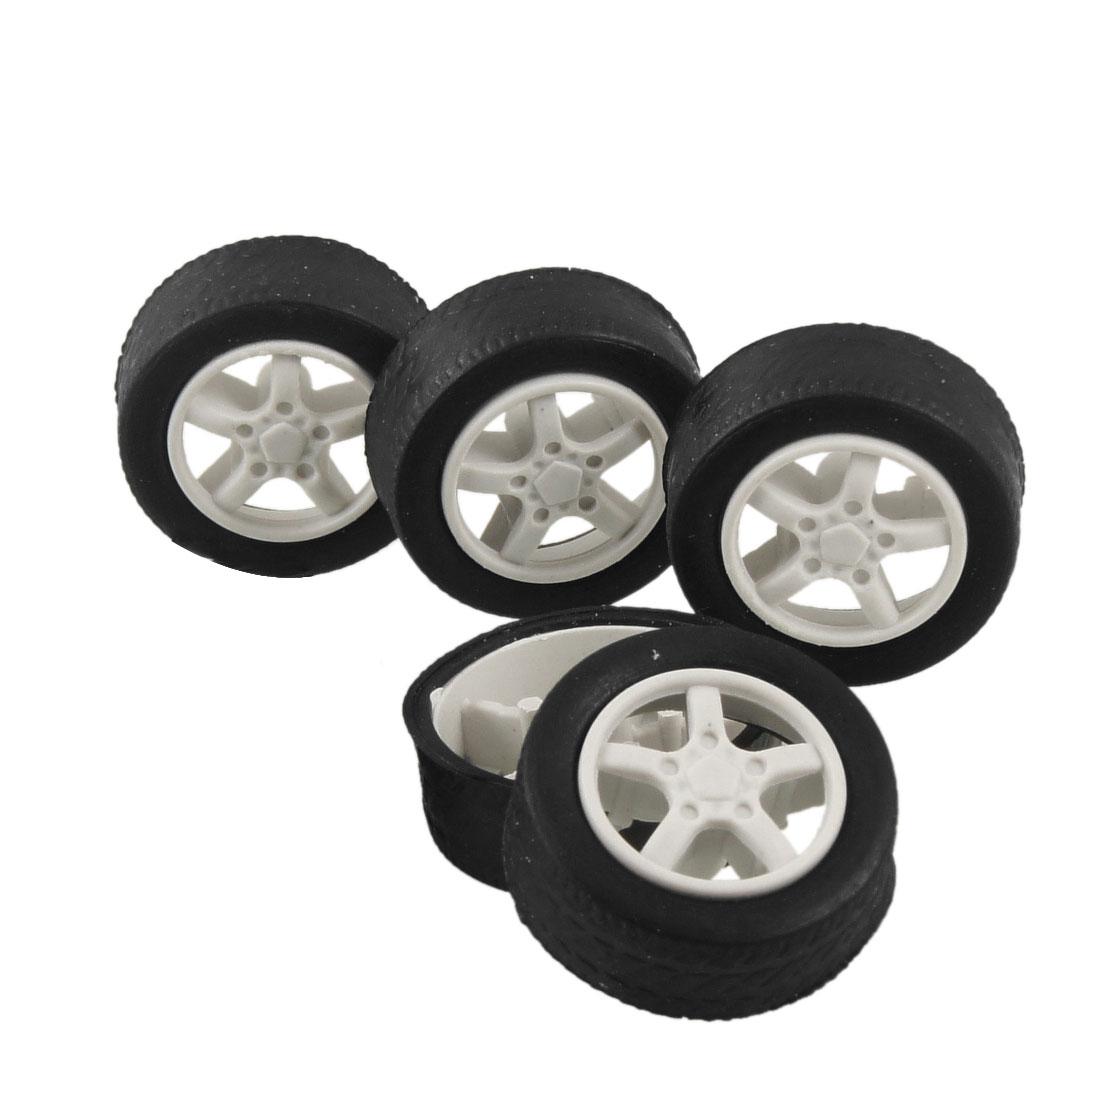 5 Pcs Repairing Part 31mm x 11mm Car Truck Vehicles Toy Wheels